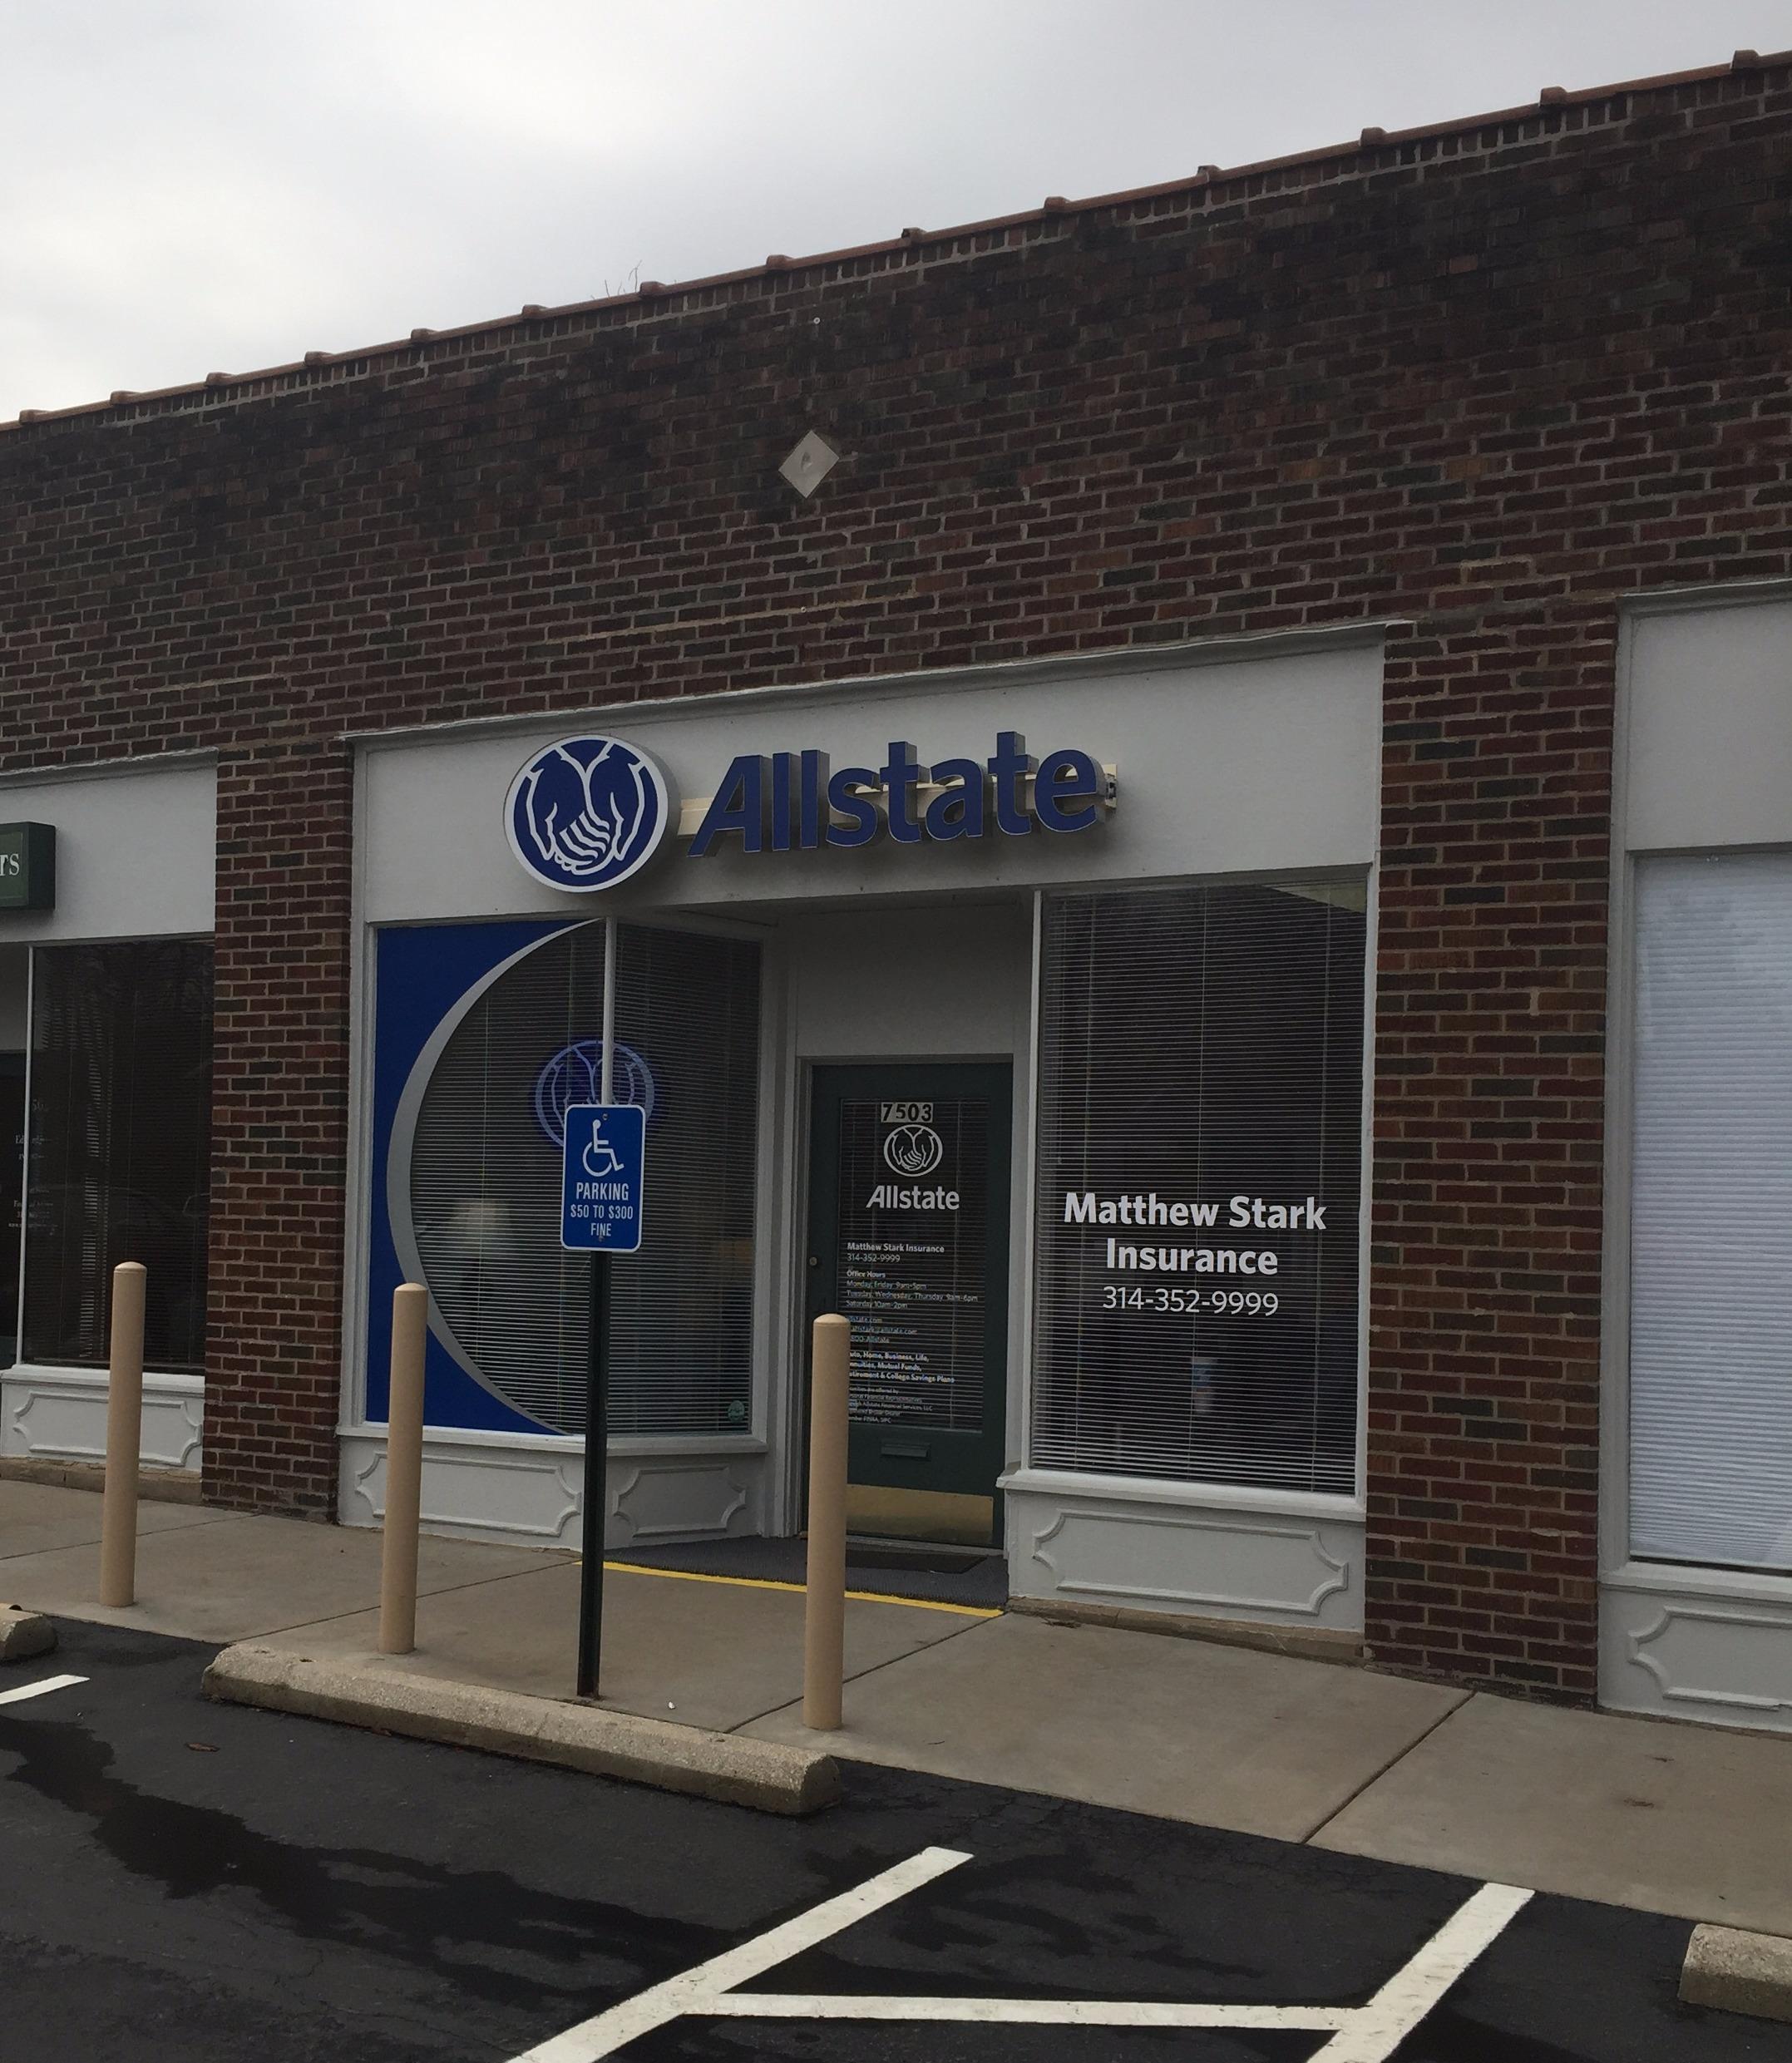 Matt Stark: Allstate Insurance